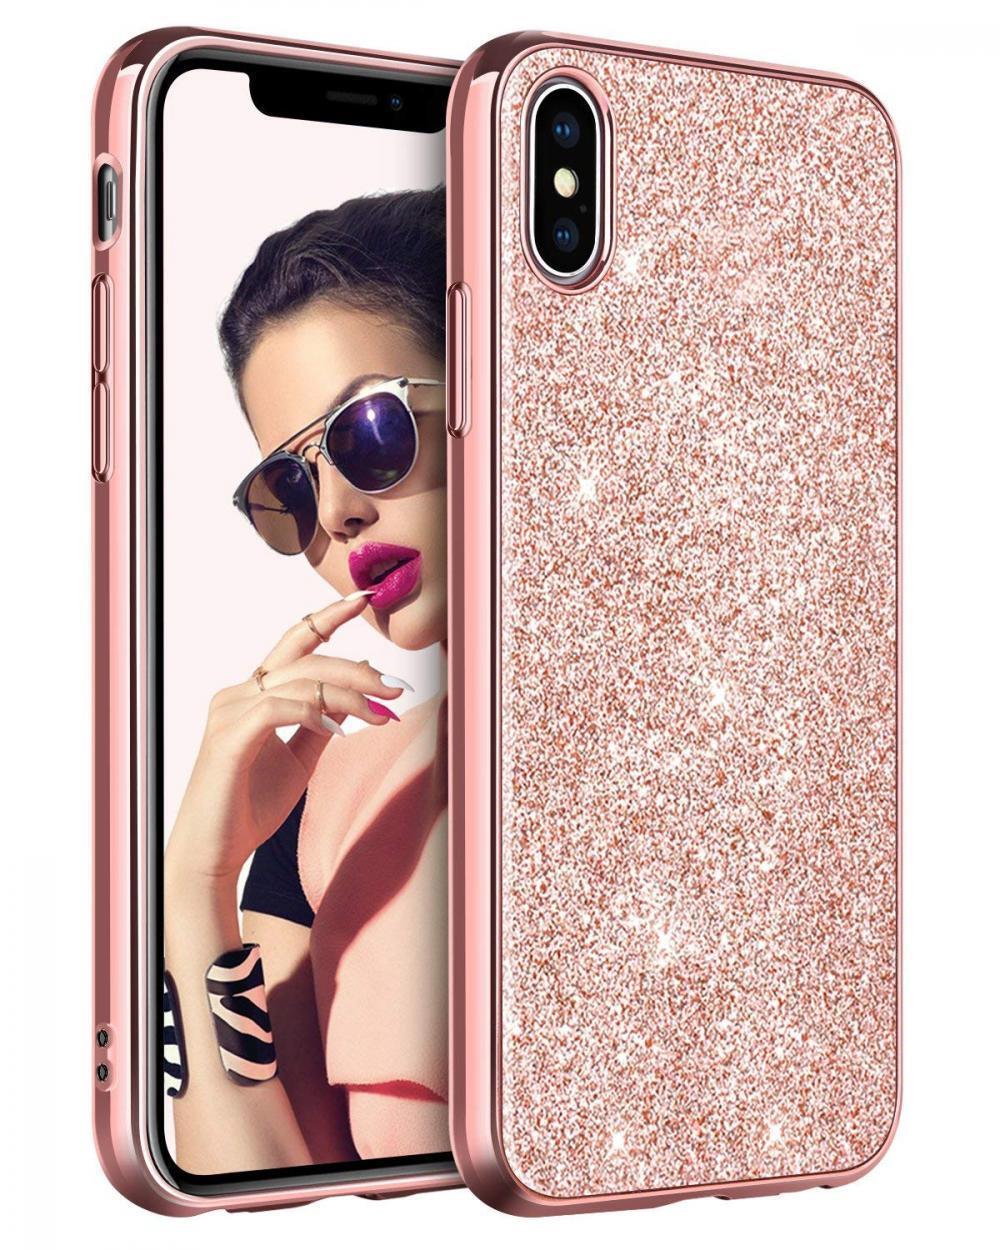 BENTOBEN Phone Case for Apple iPhone X/10, Protective Shockp